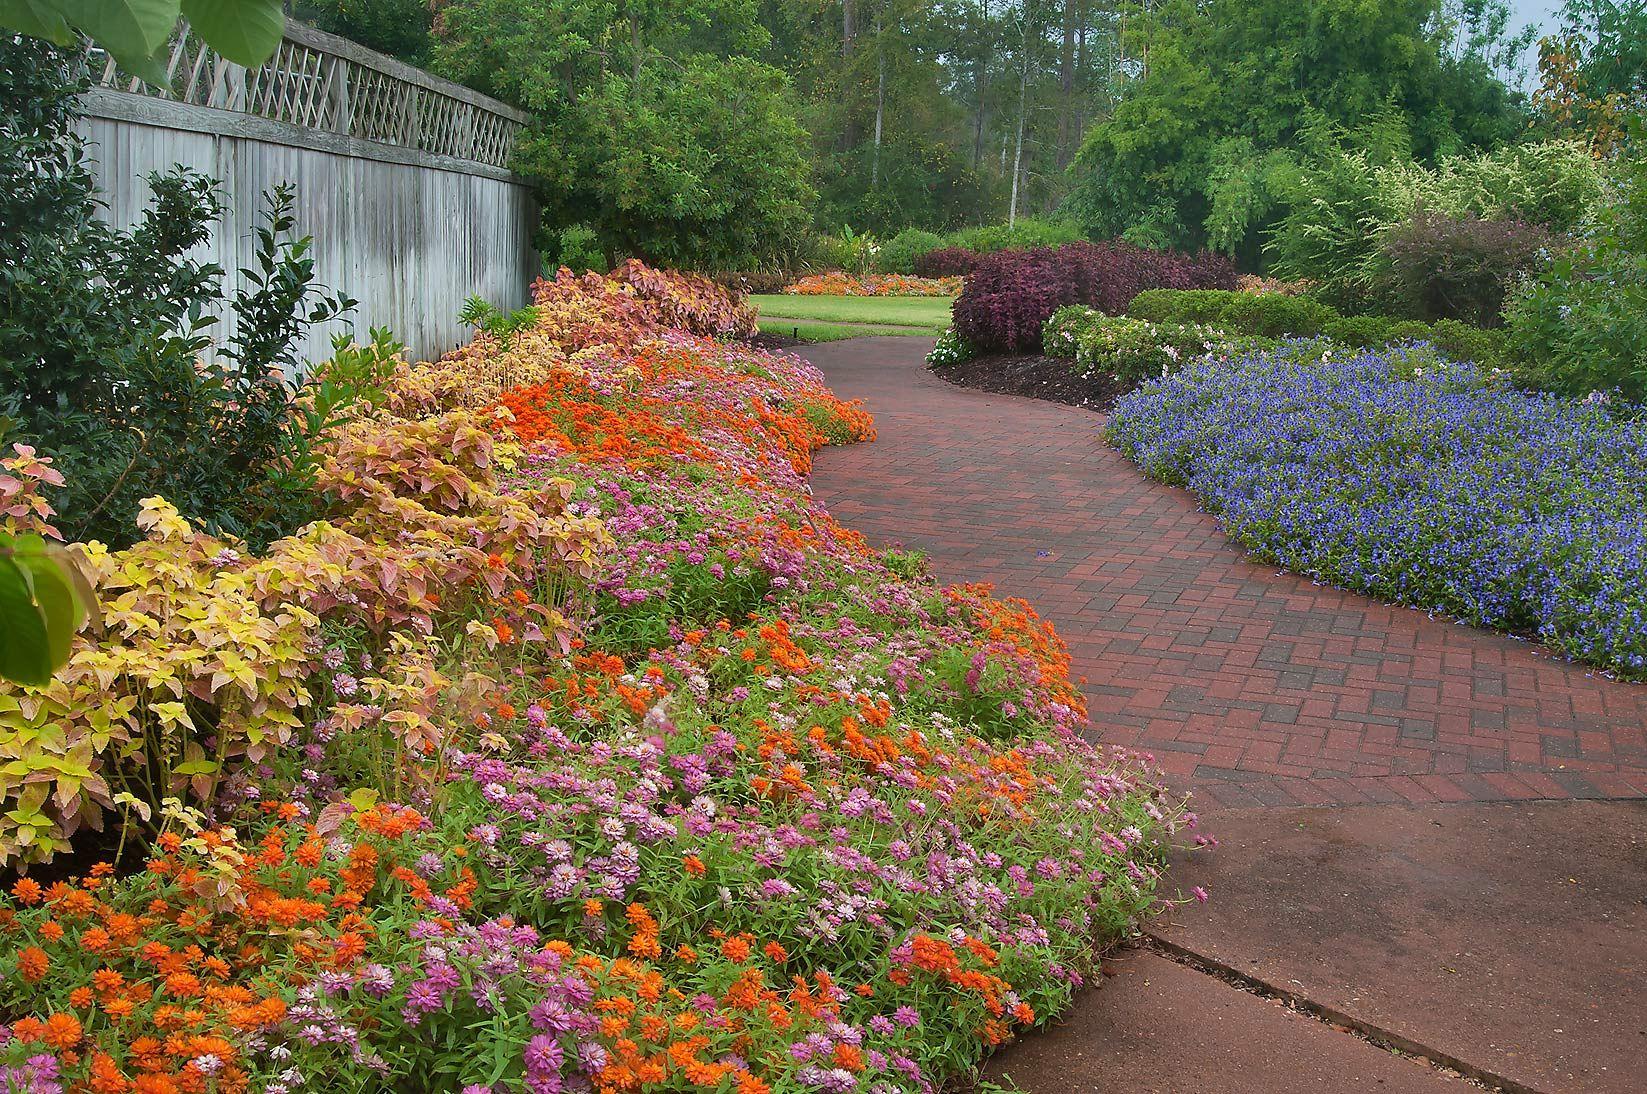 Flower Garden Designs You Can Get Additional Details At The Image Link Flower Garden Design Botanical Gardens Garden Design